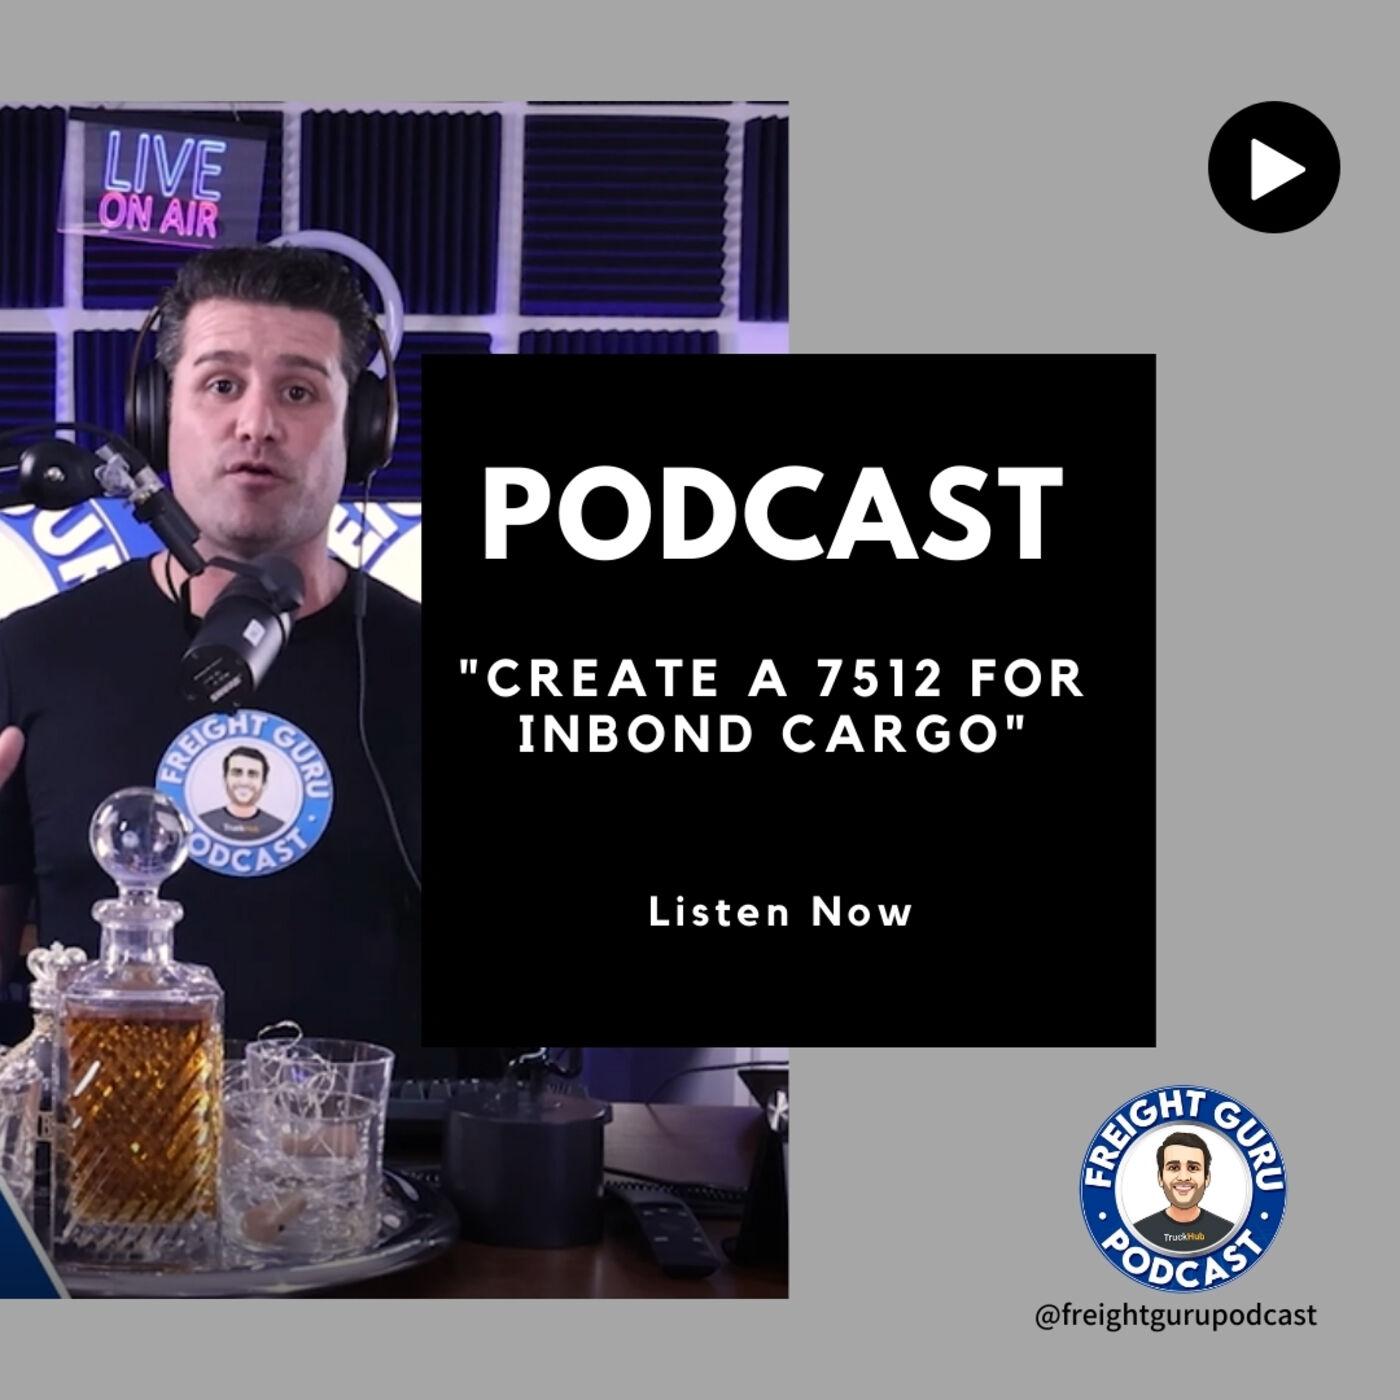 Create a 7512 for Inbond Cargo - Freight Guru Podcast Ep. 18